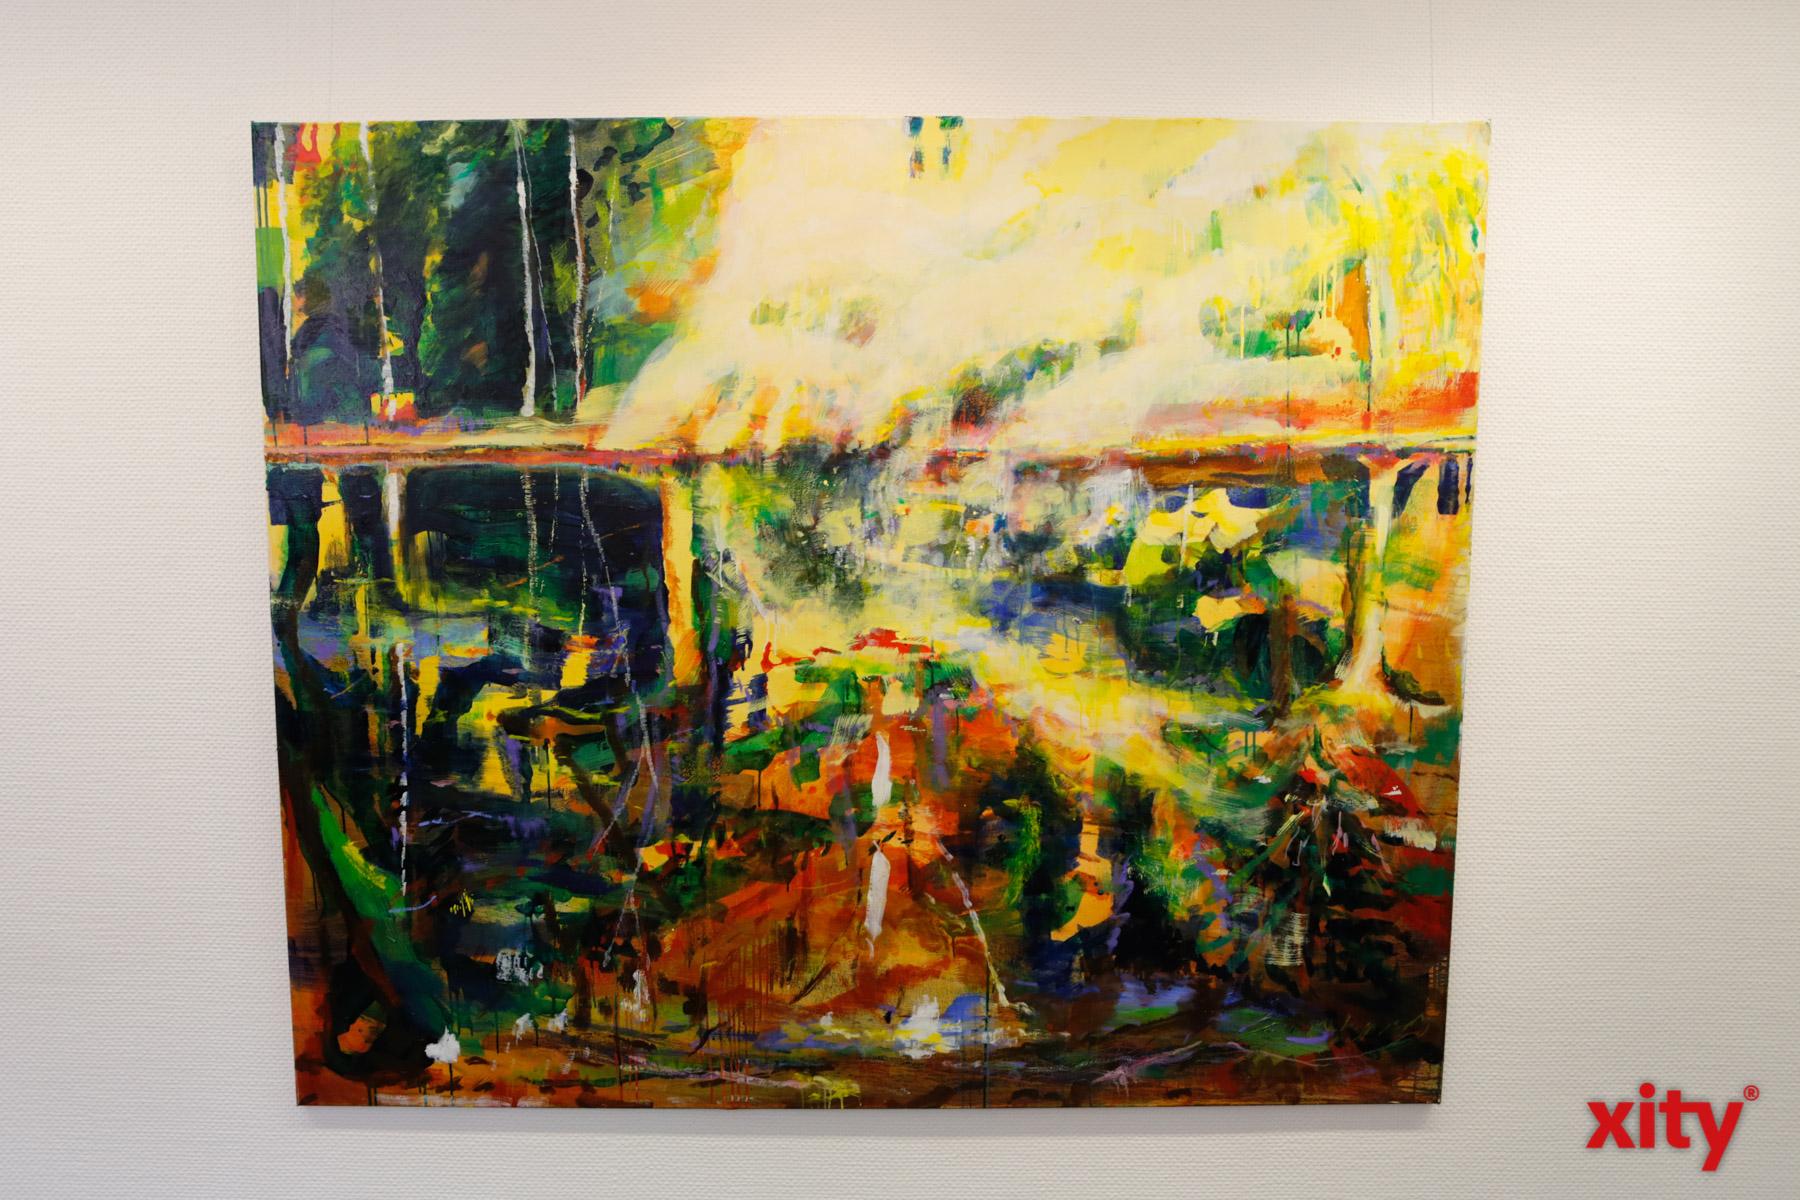 Duft der Farben, 150cm x 180cm, Öl auf Leinwand, 2019 Mina Takagi (Foto: xity)